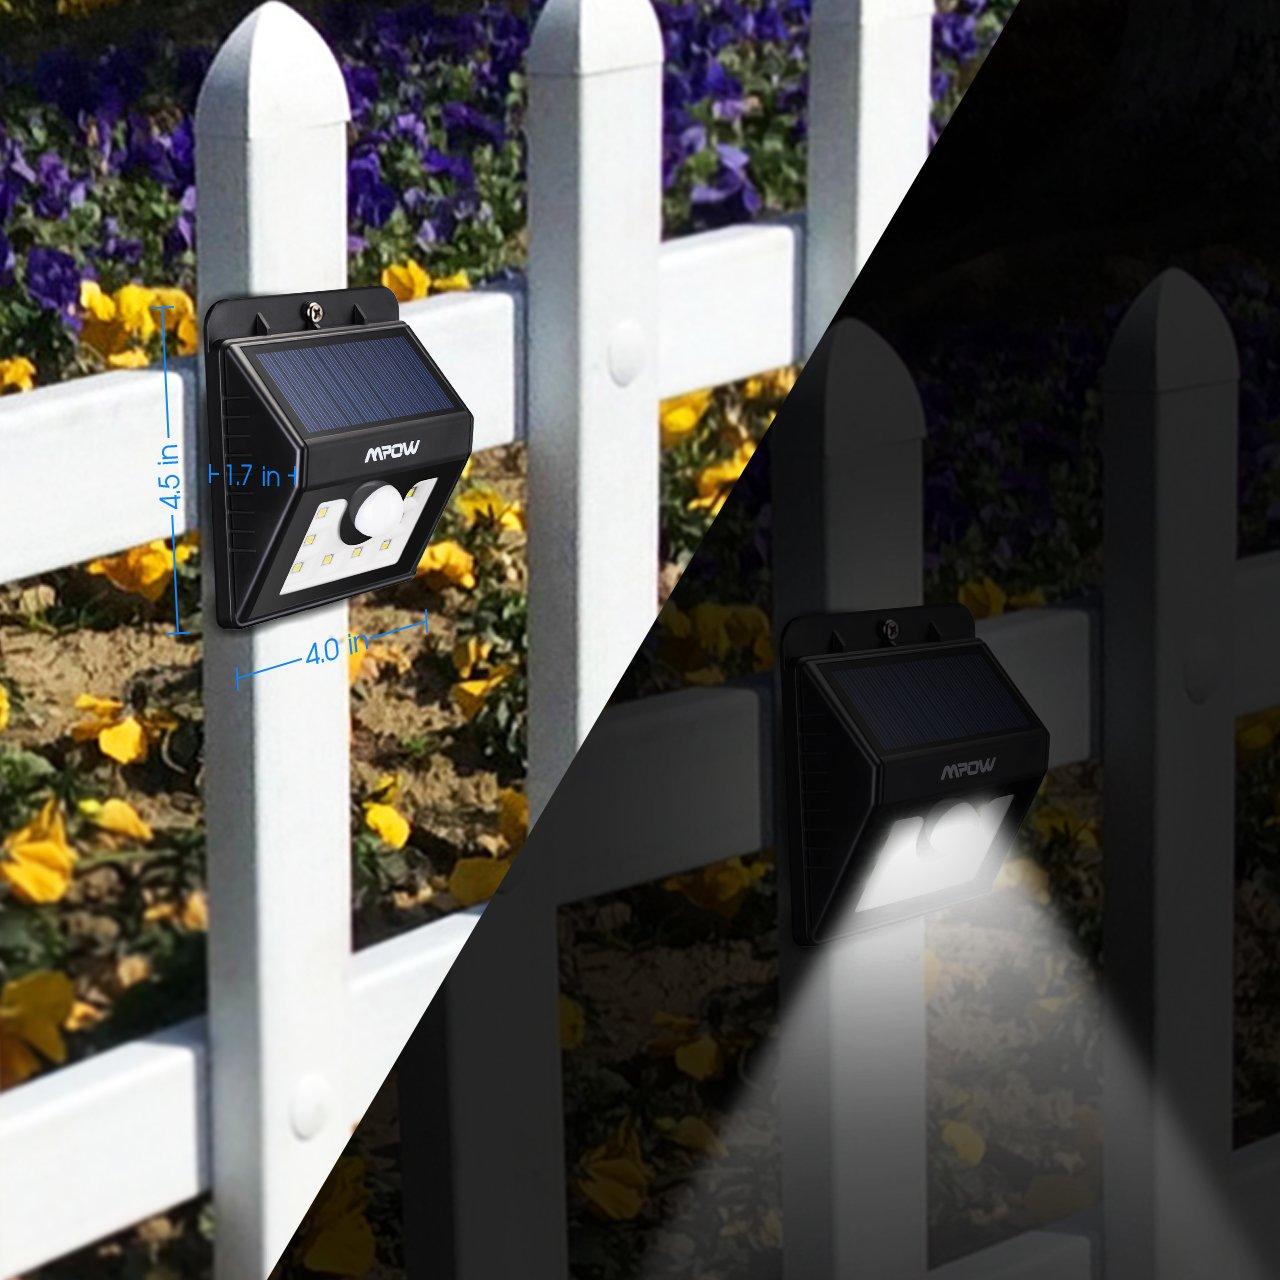 mpow solar lights motion sensor security lights 3in1 waterproof solar powered lights outdoor lights for garden fence patio yard walkway driveway